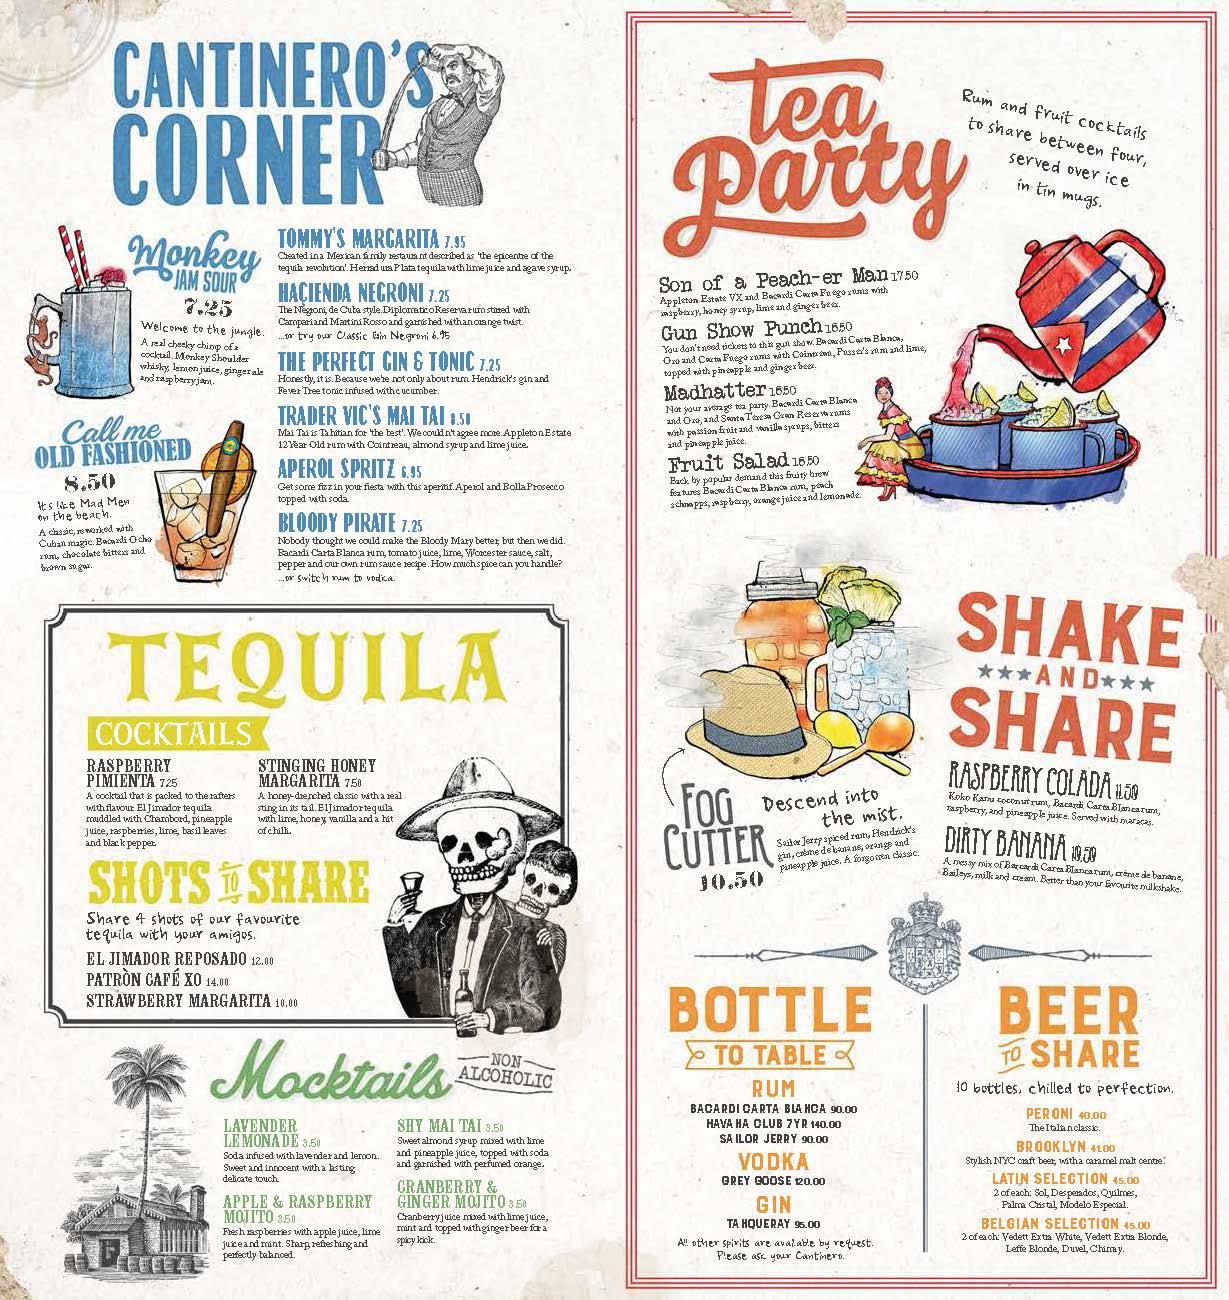 revolucion de cuba cocktail illustrations